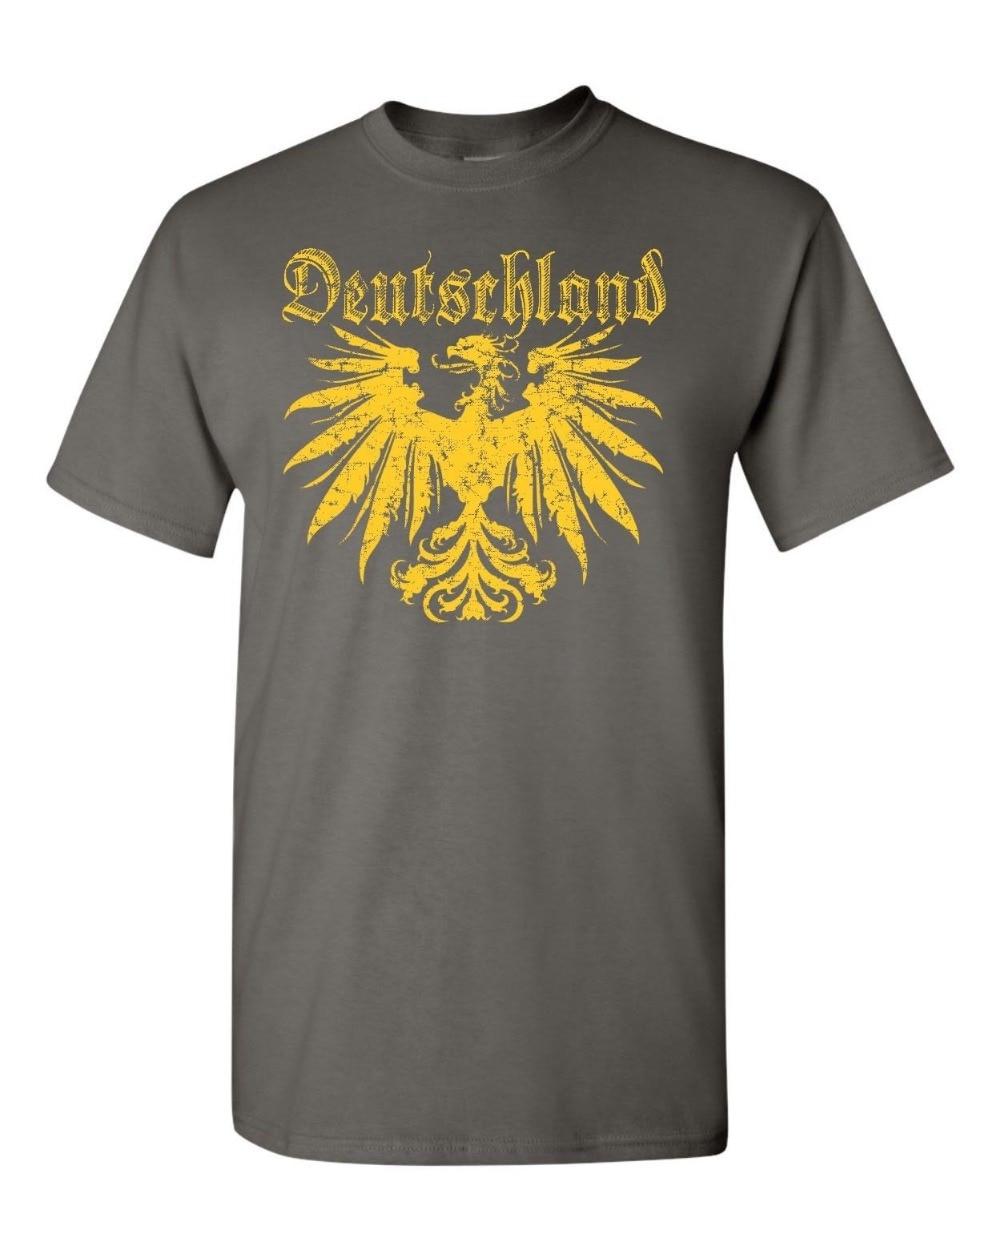 Deutschland German Eagle Germany Golden Eagle New 2019 Fashion 100% Cotton for Man Shirts Christian T Shirt Футболка